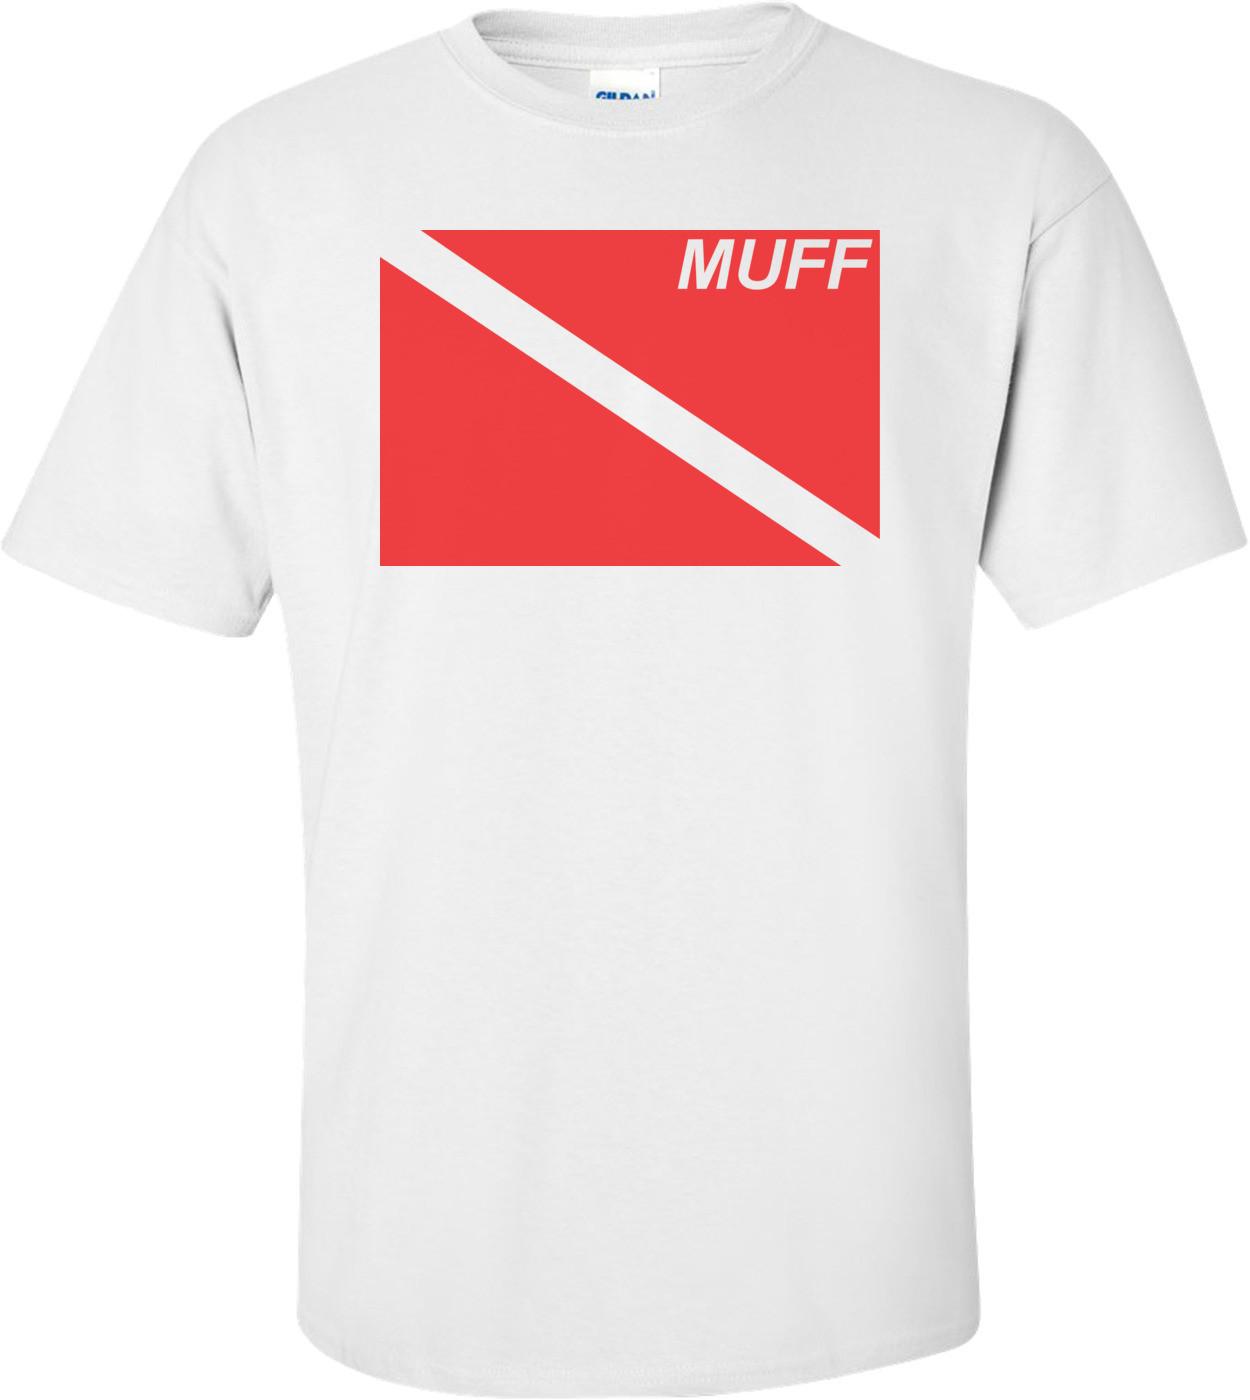 Muff Dive Flag T-shirt